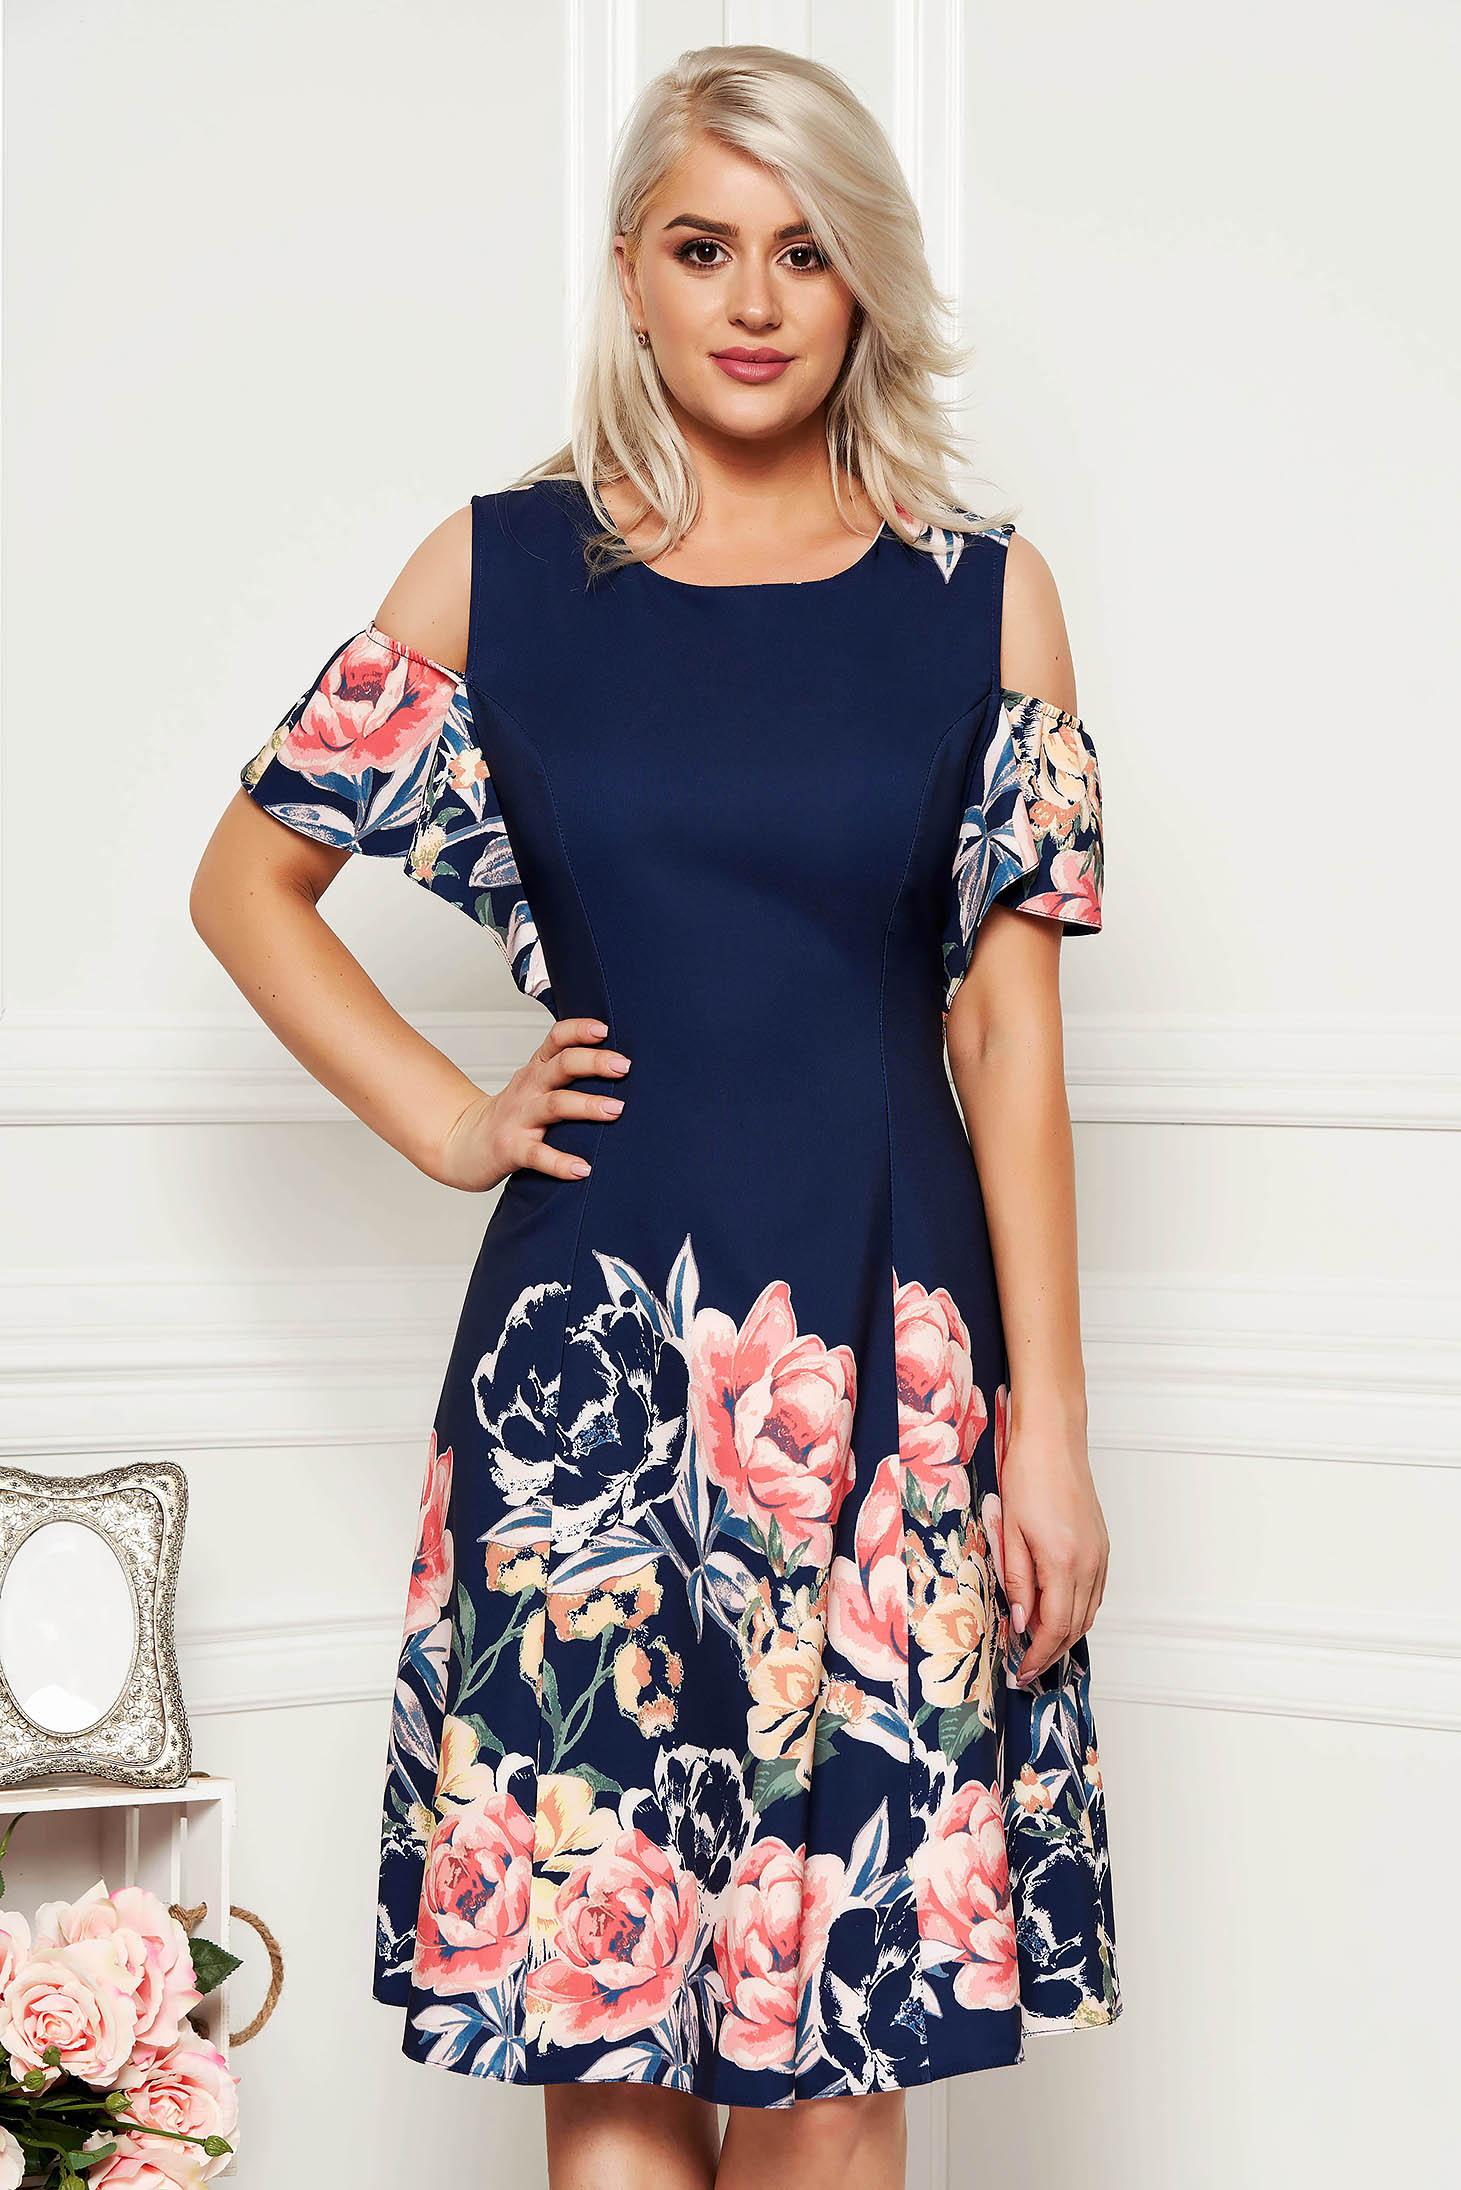 Darkblue dress elegant cloche midi with floral print both shoulders cut out neckline